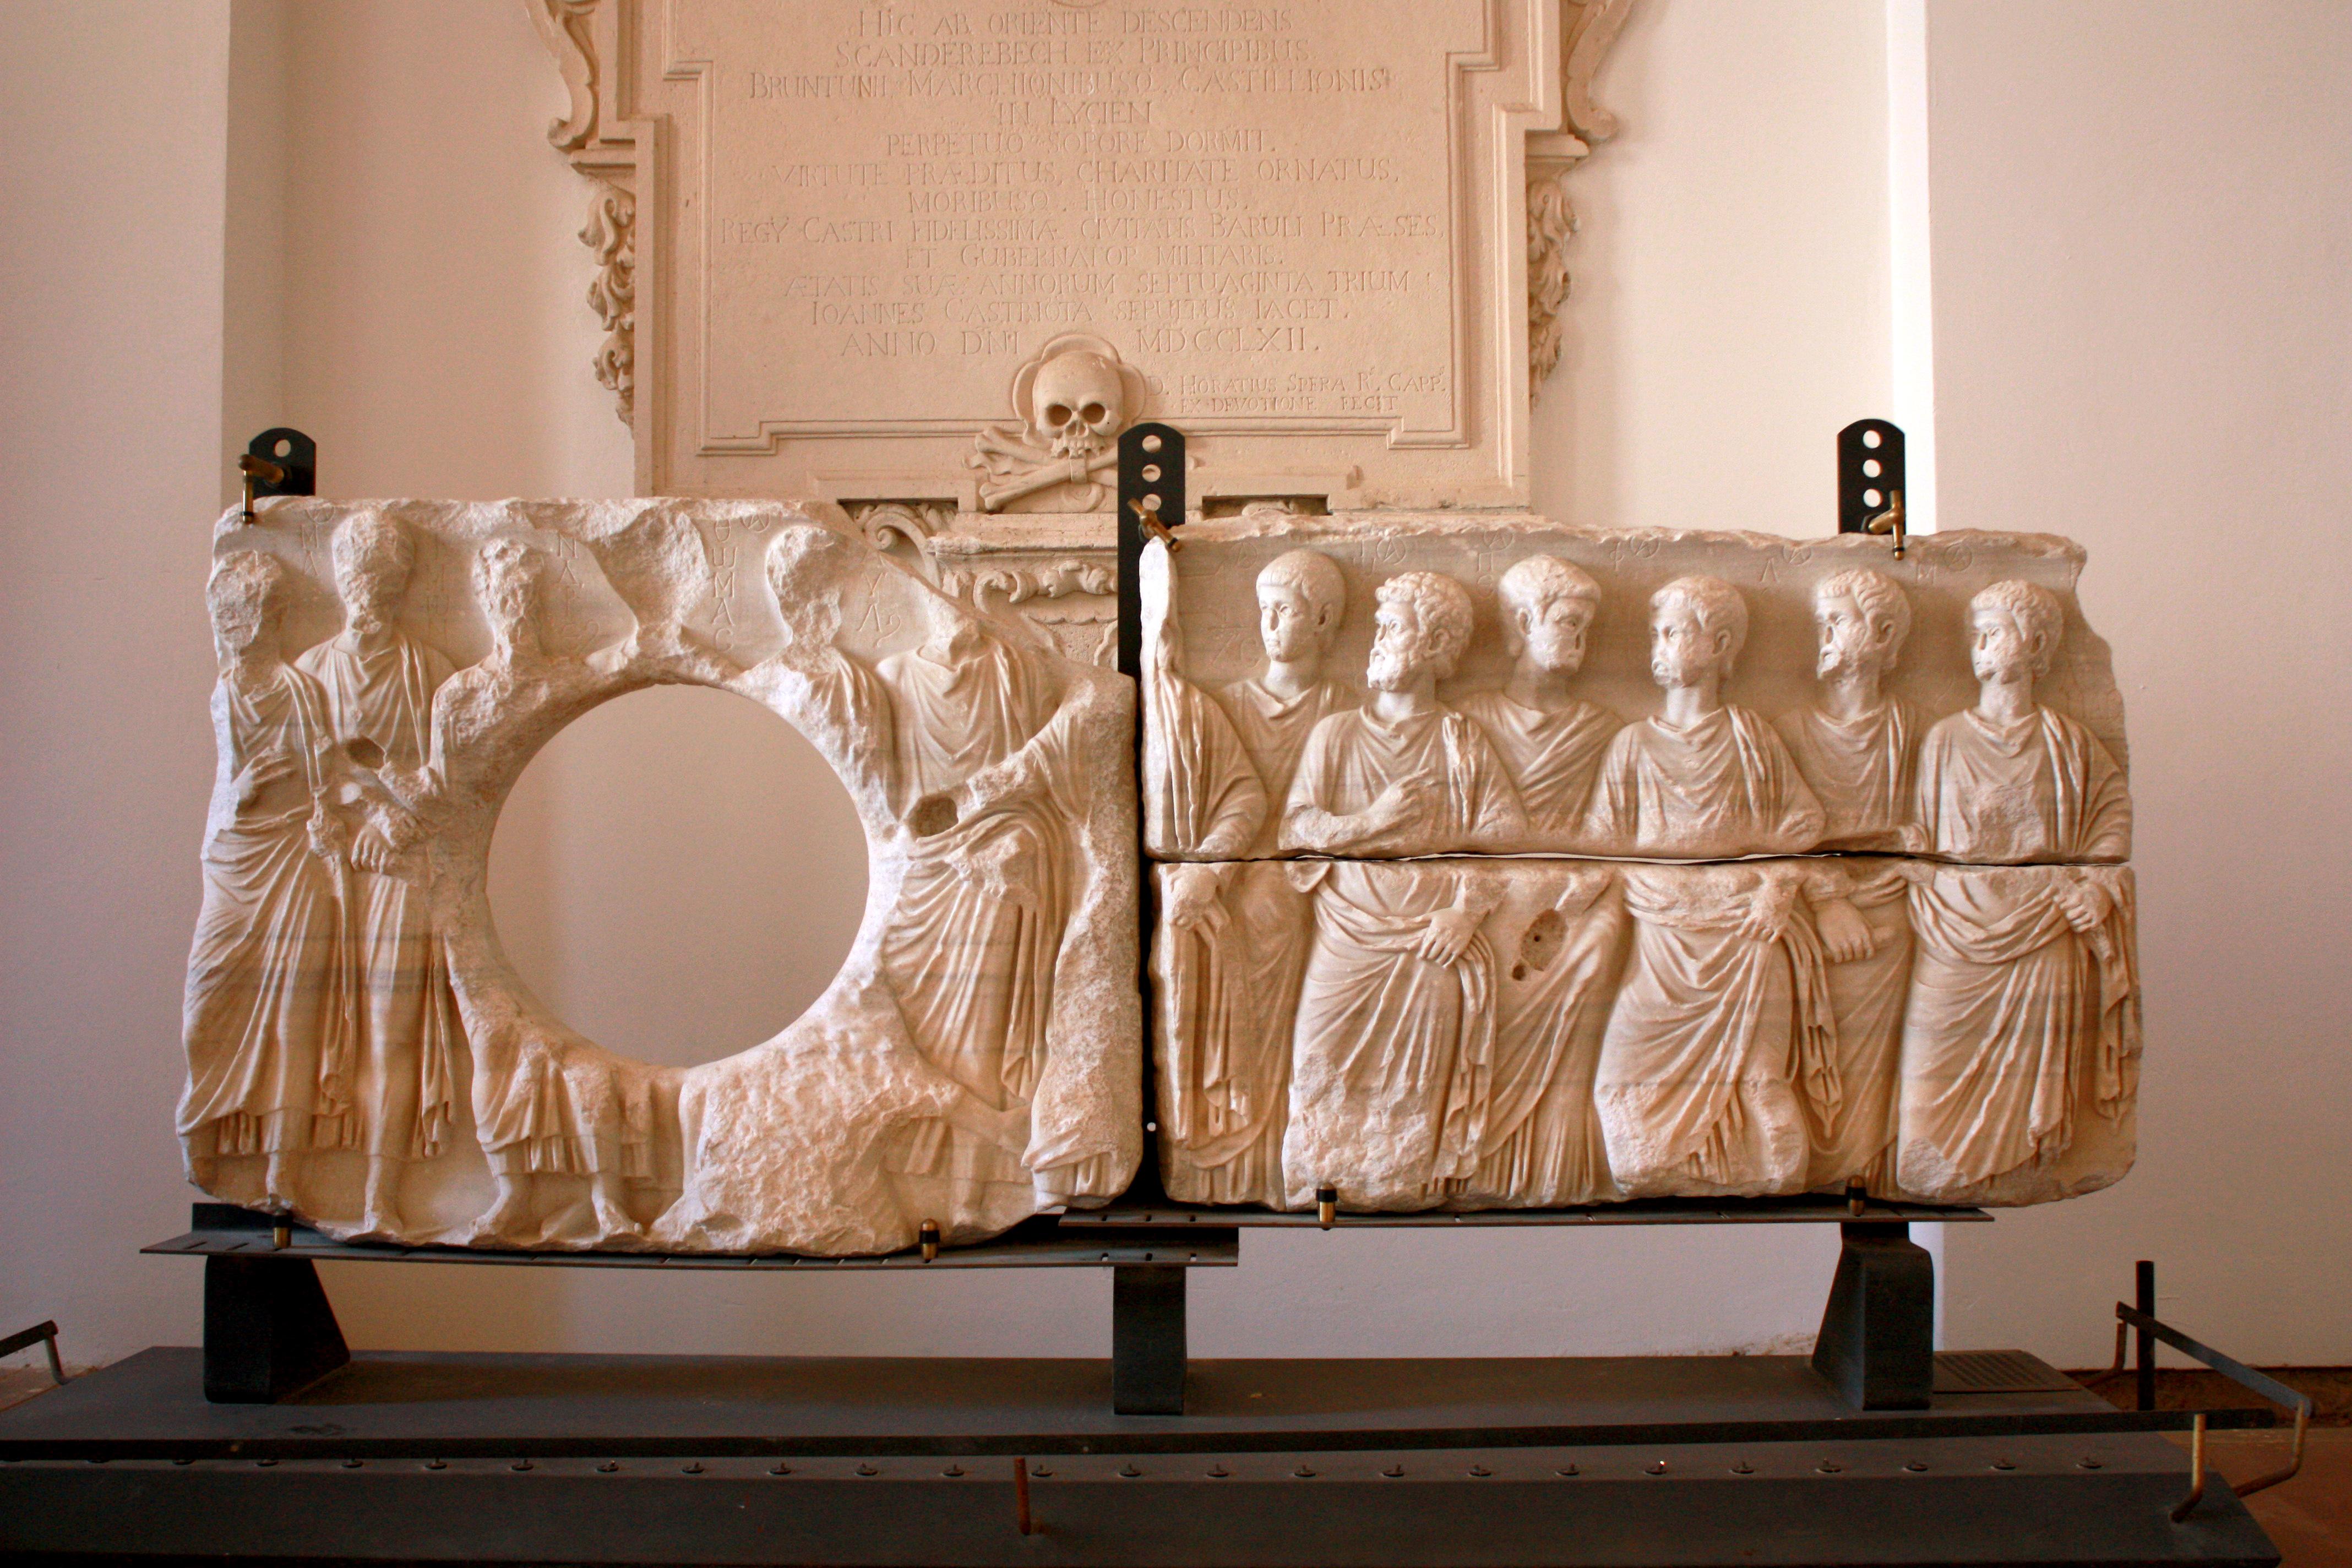 Il Sarcofago degli Apostoli